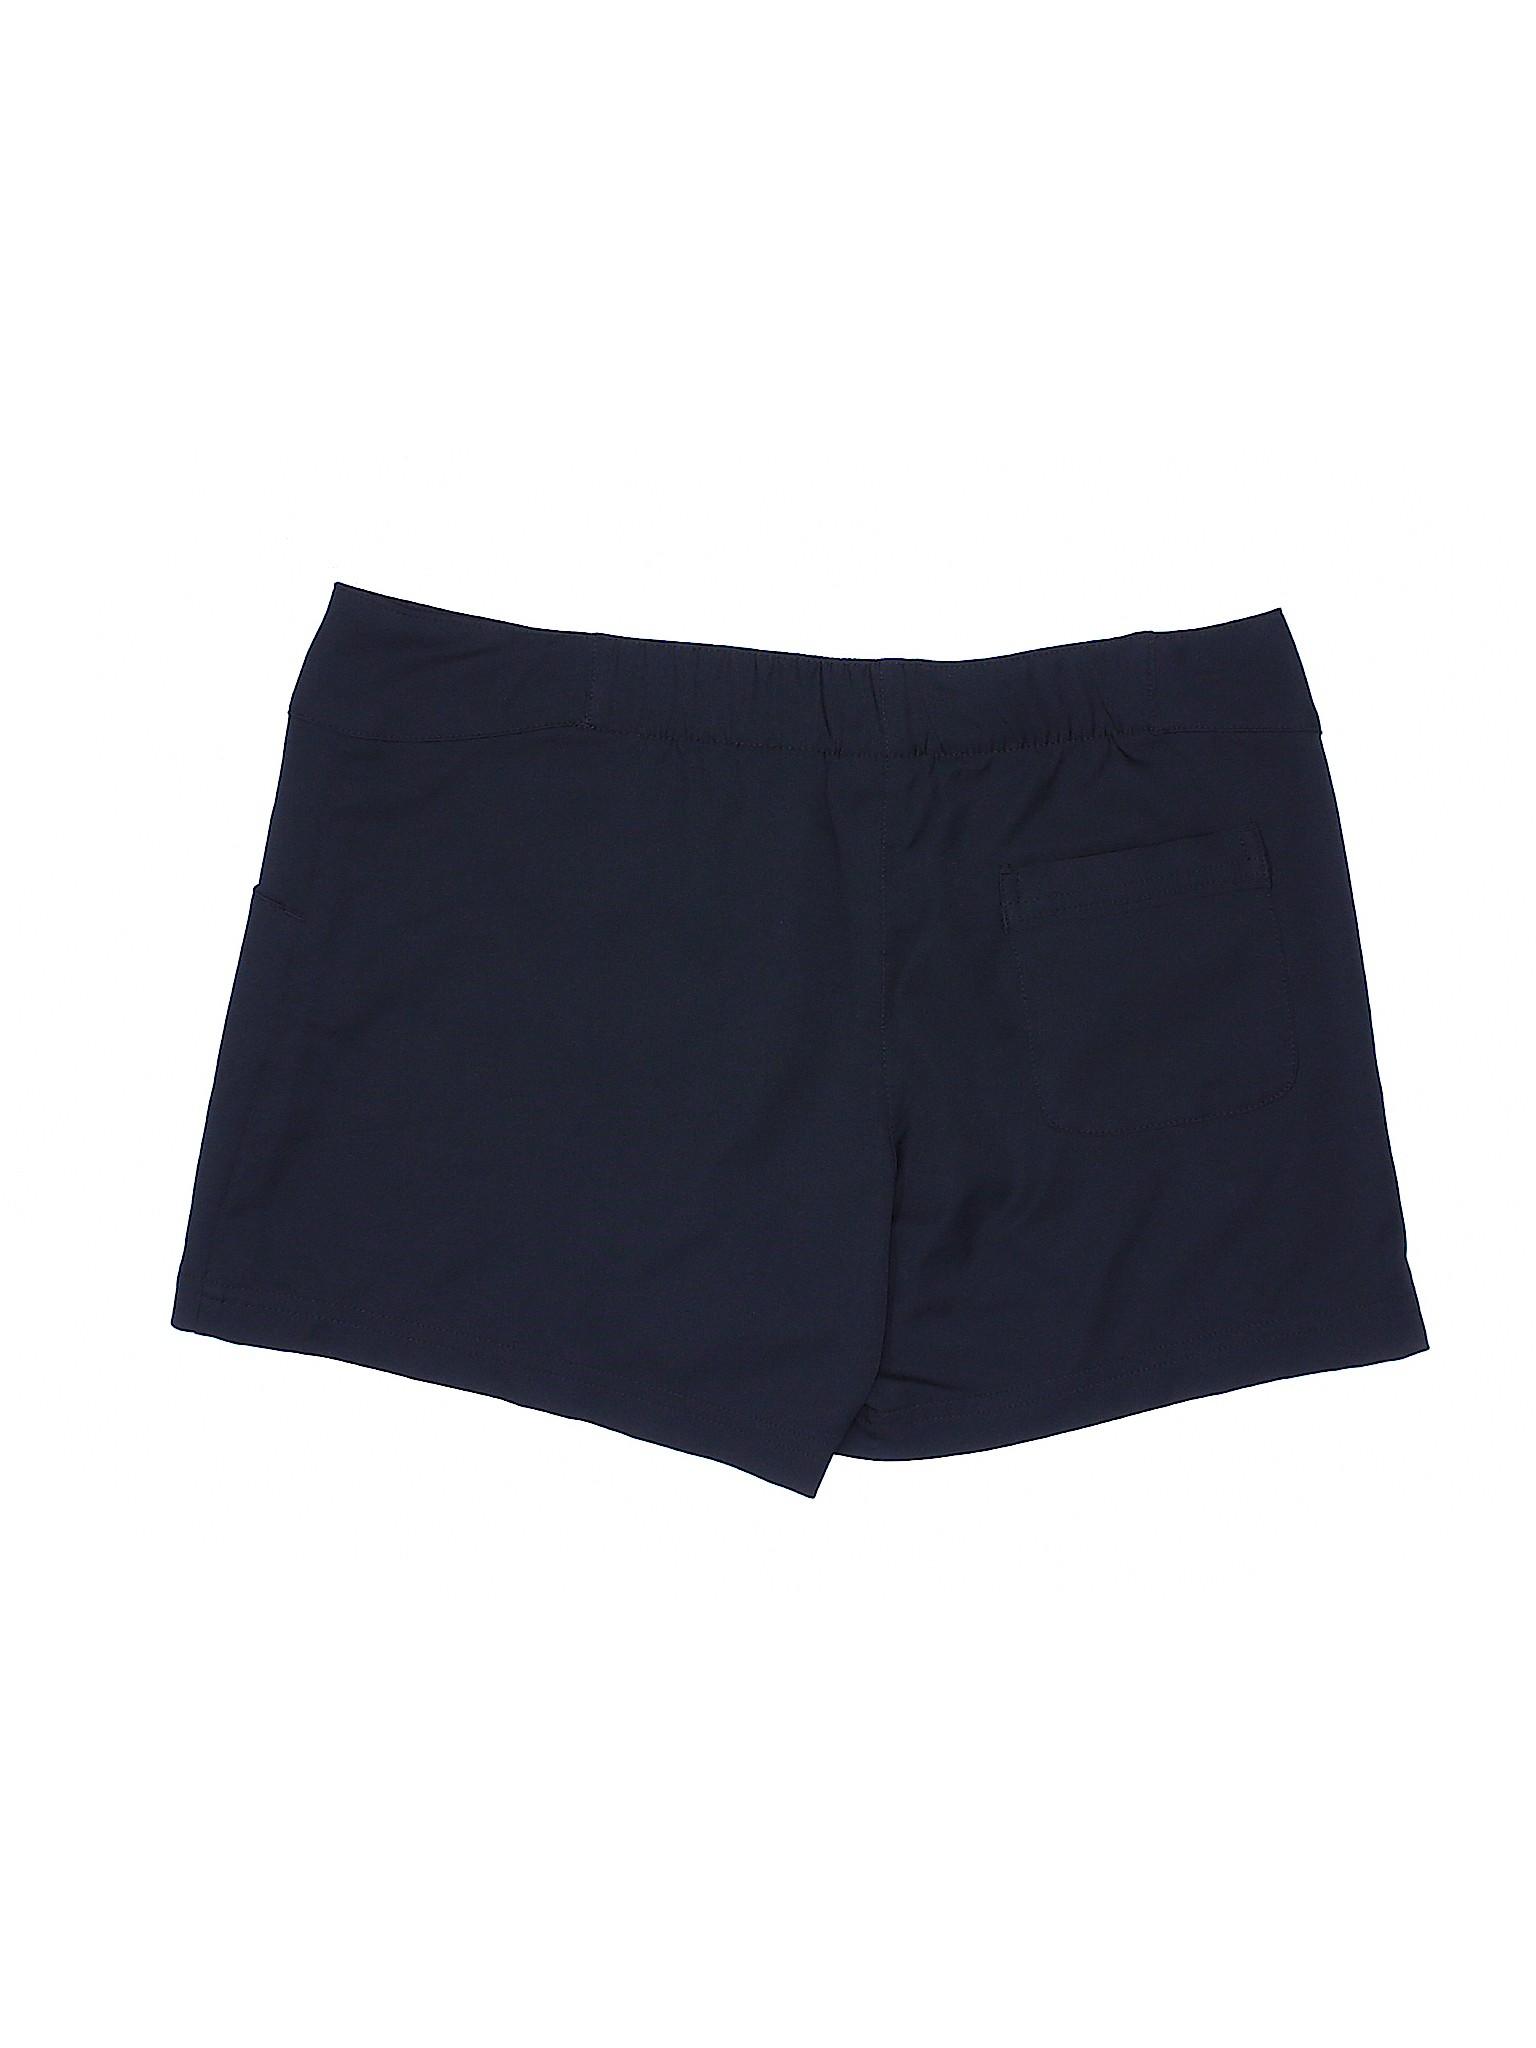 Adidas Adidas Boutique Boutique Shorts Athletic Athletic pgwqzt4